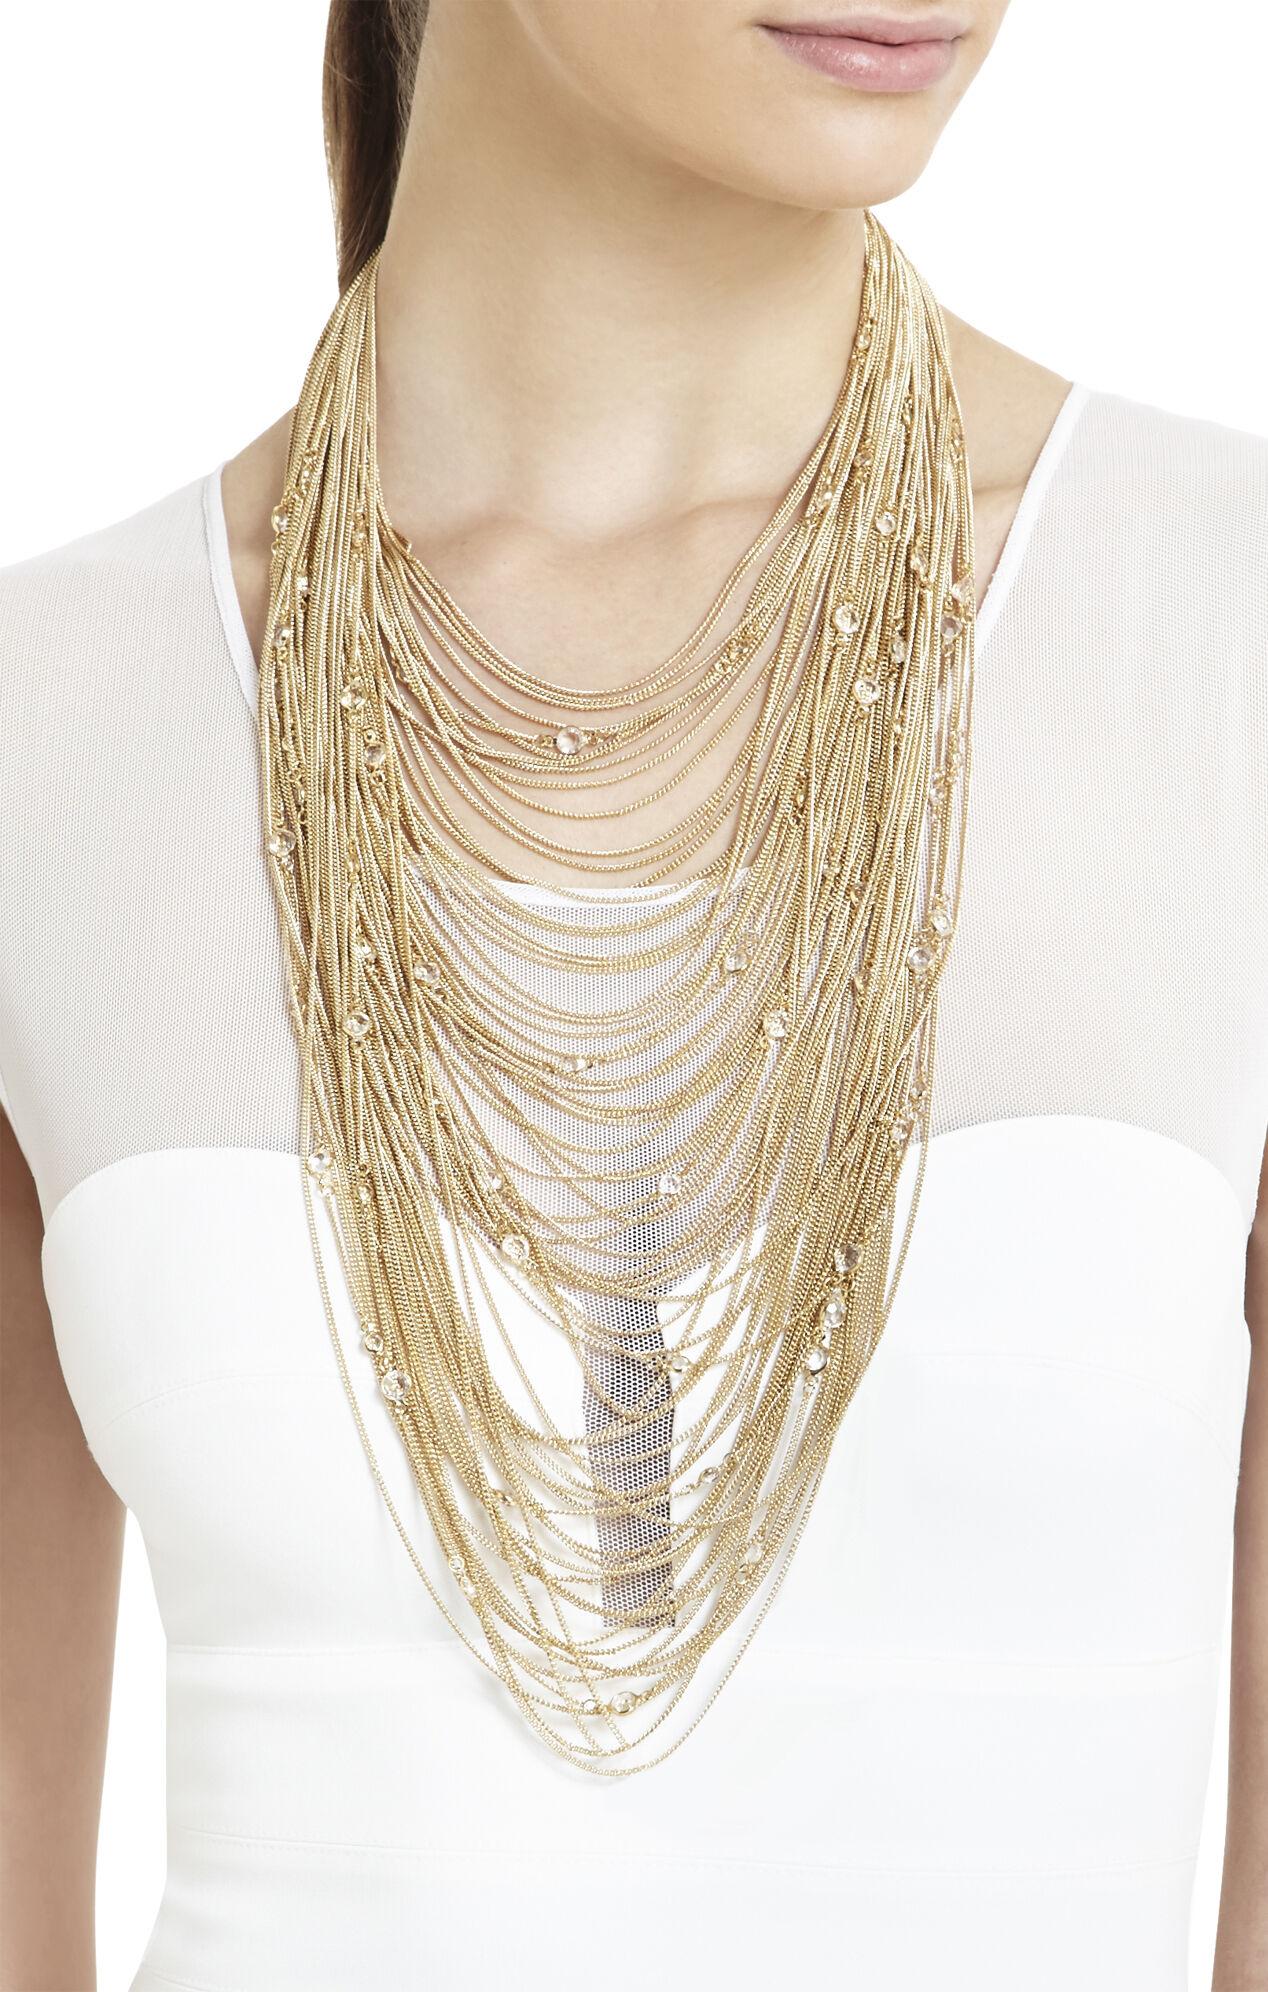 Delicate Draped-Chain Necklace